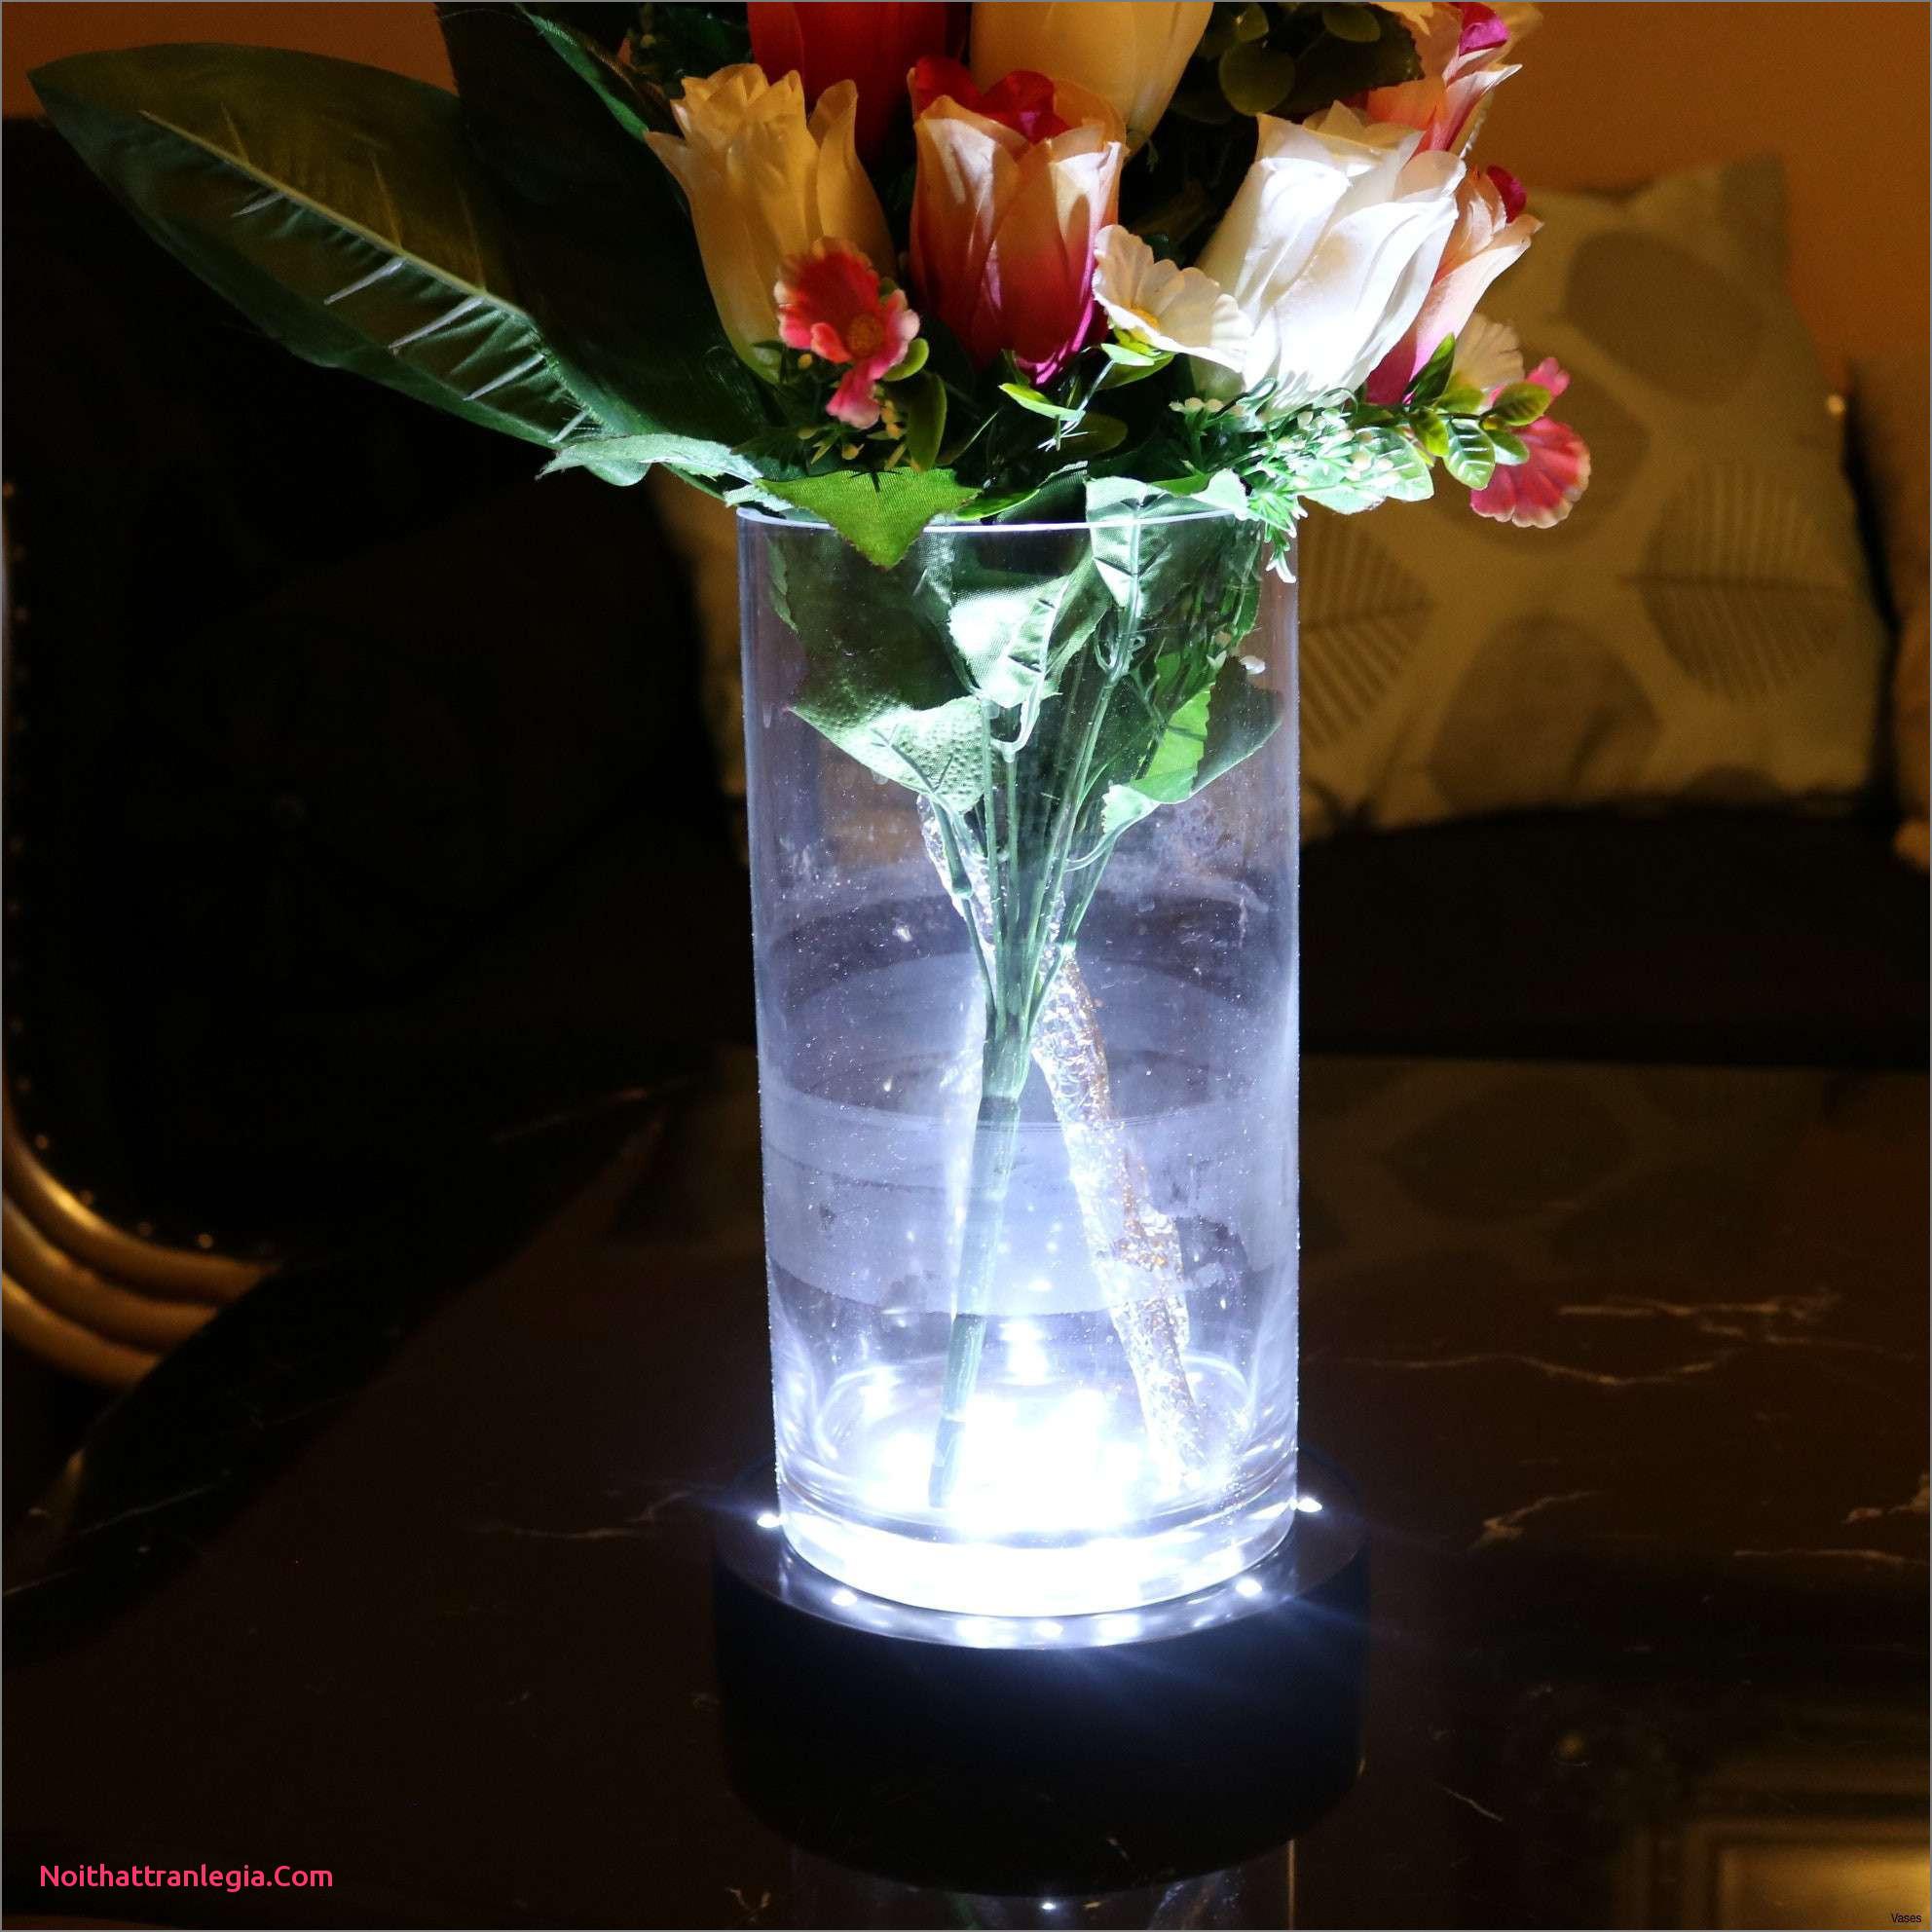 vintage pressed glass vase of 20 cut glass antique vase noithattranlegia vases design with glass wall vases gallery vases disposable plastic single cheap flower rose vasei 0d design glass